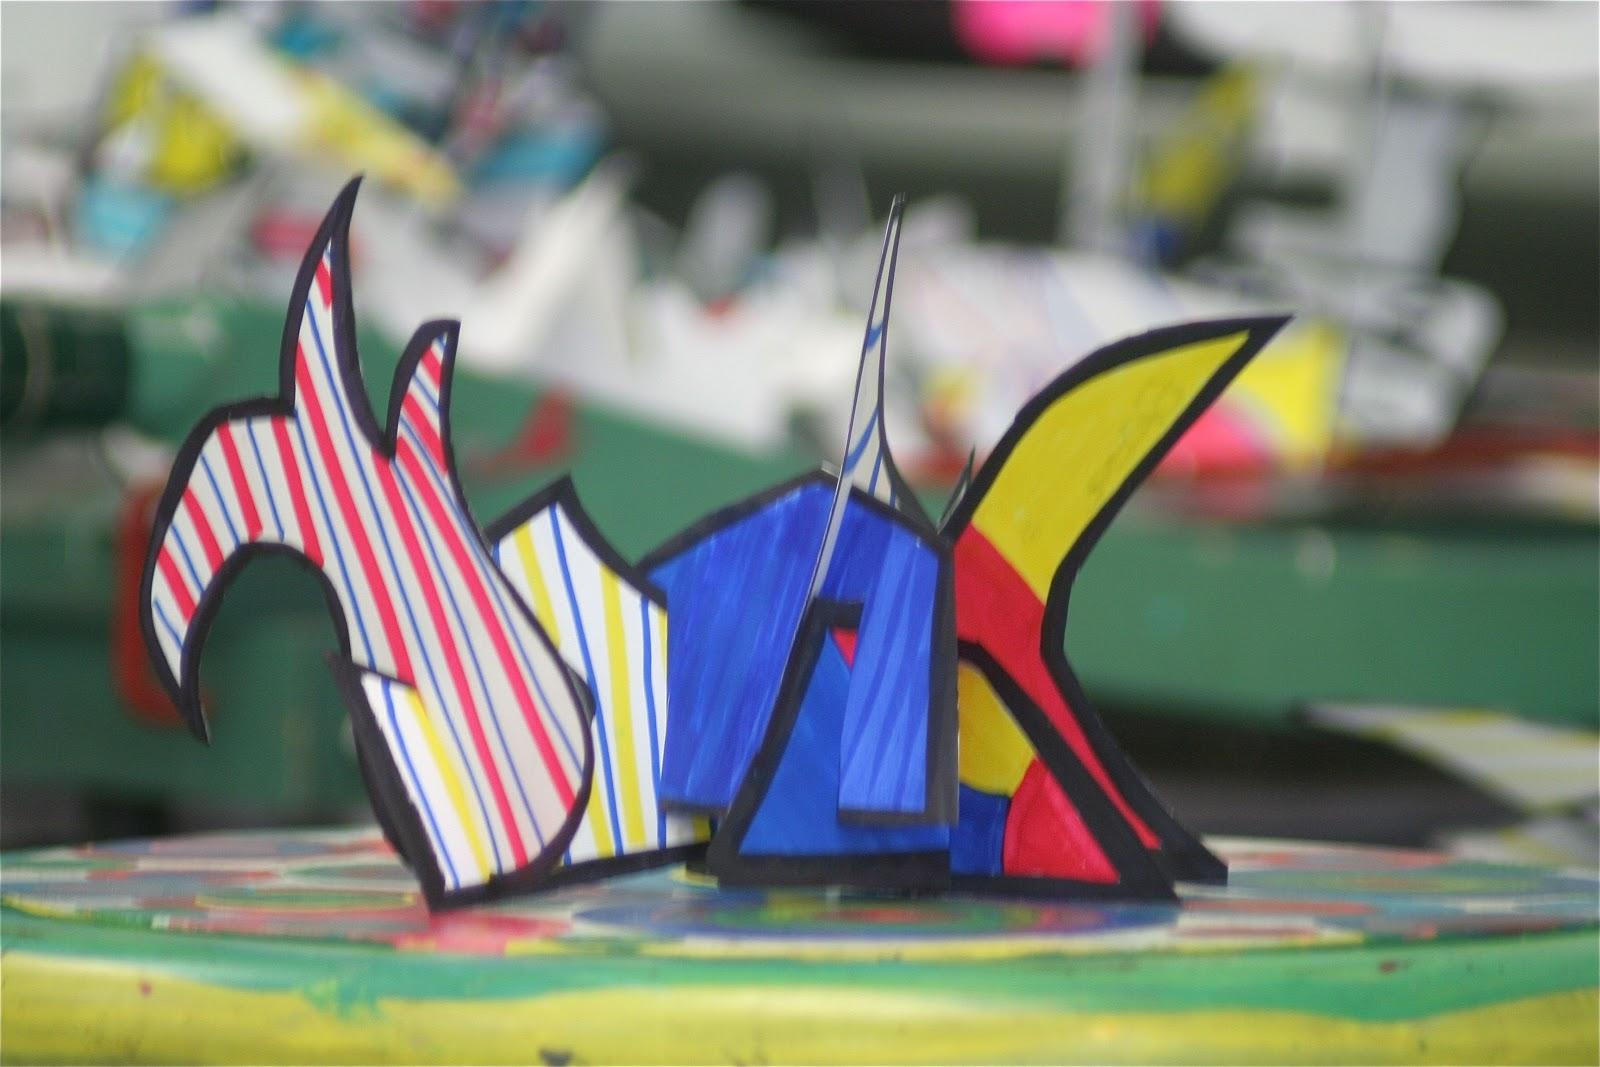 Splish Splash Splatter Dubuffet Sculptures